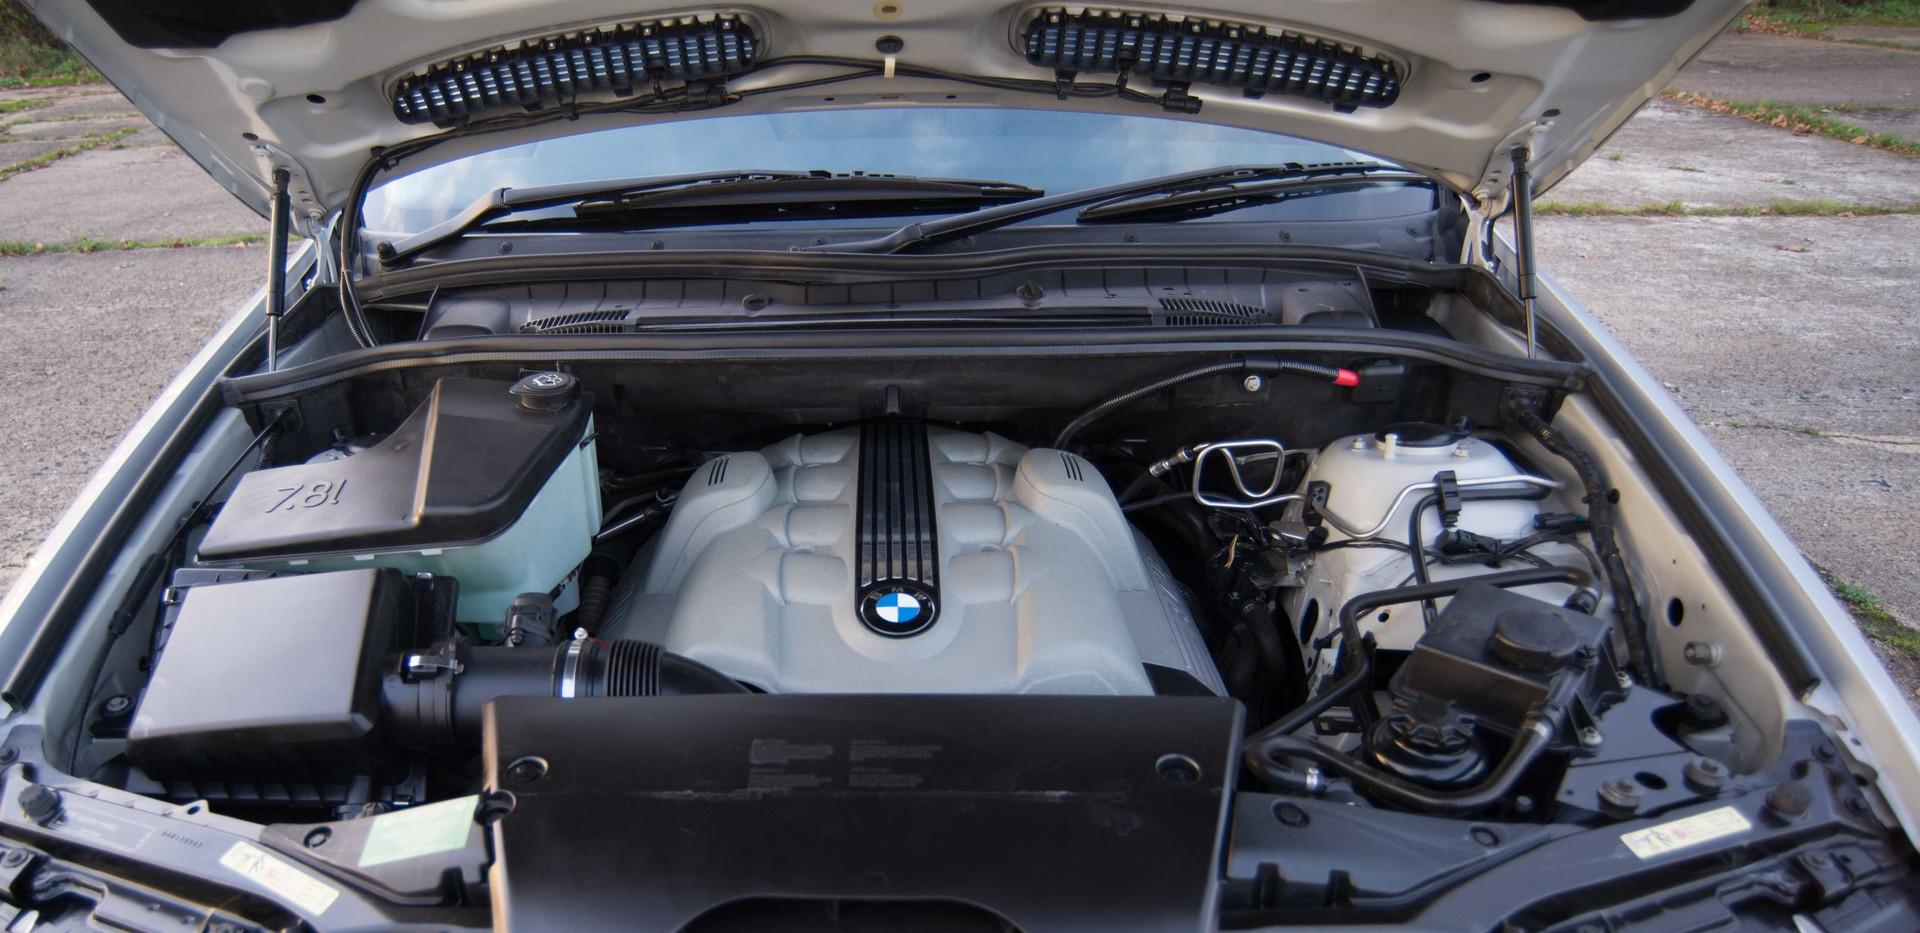 BMW E53 X5 4.4i For Sale UK London  (20